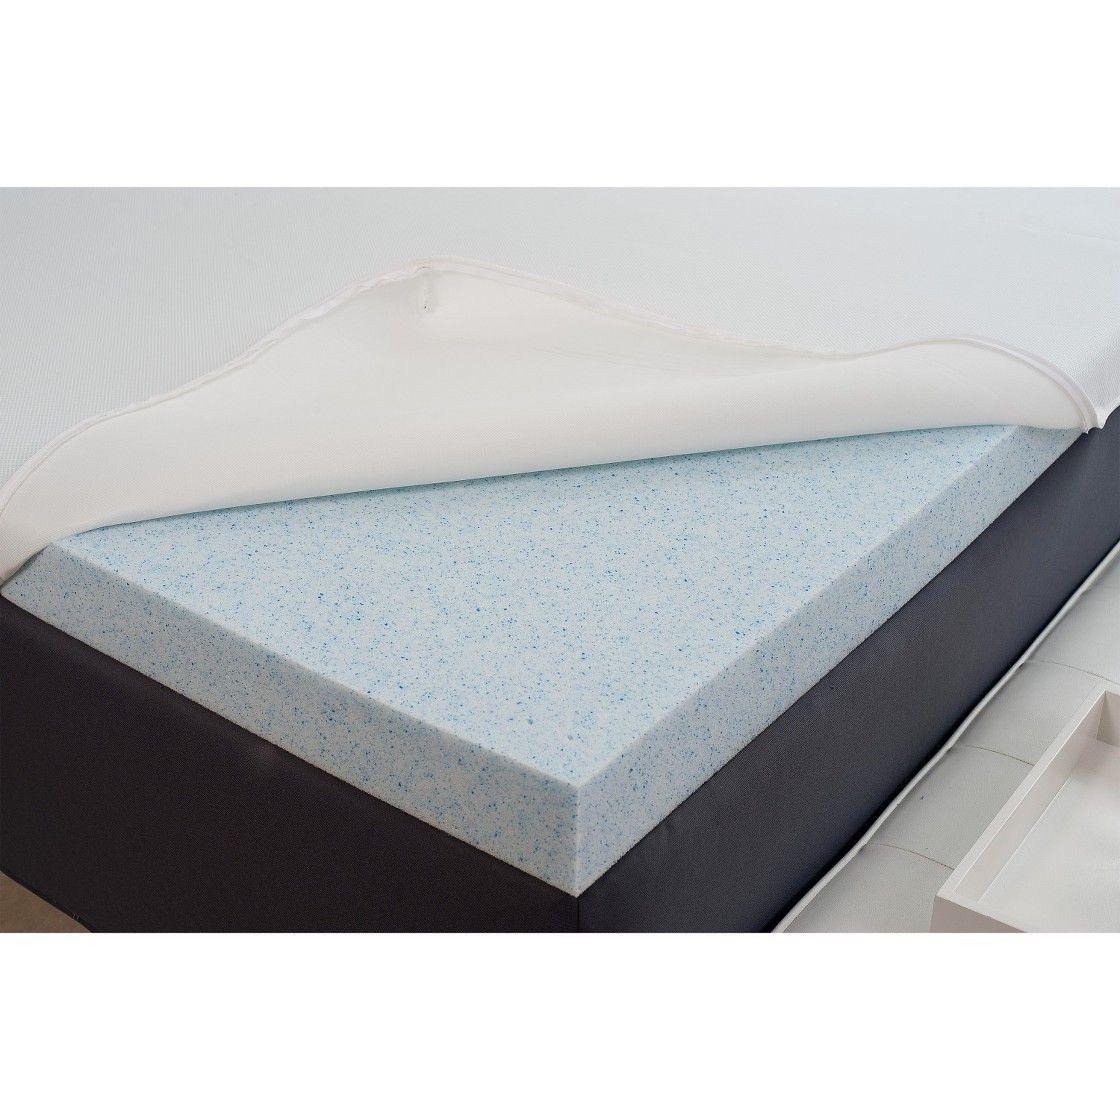 Biofresh 2 gel memory foam mattress topper clean